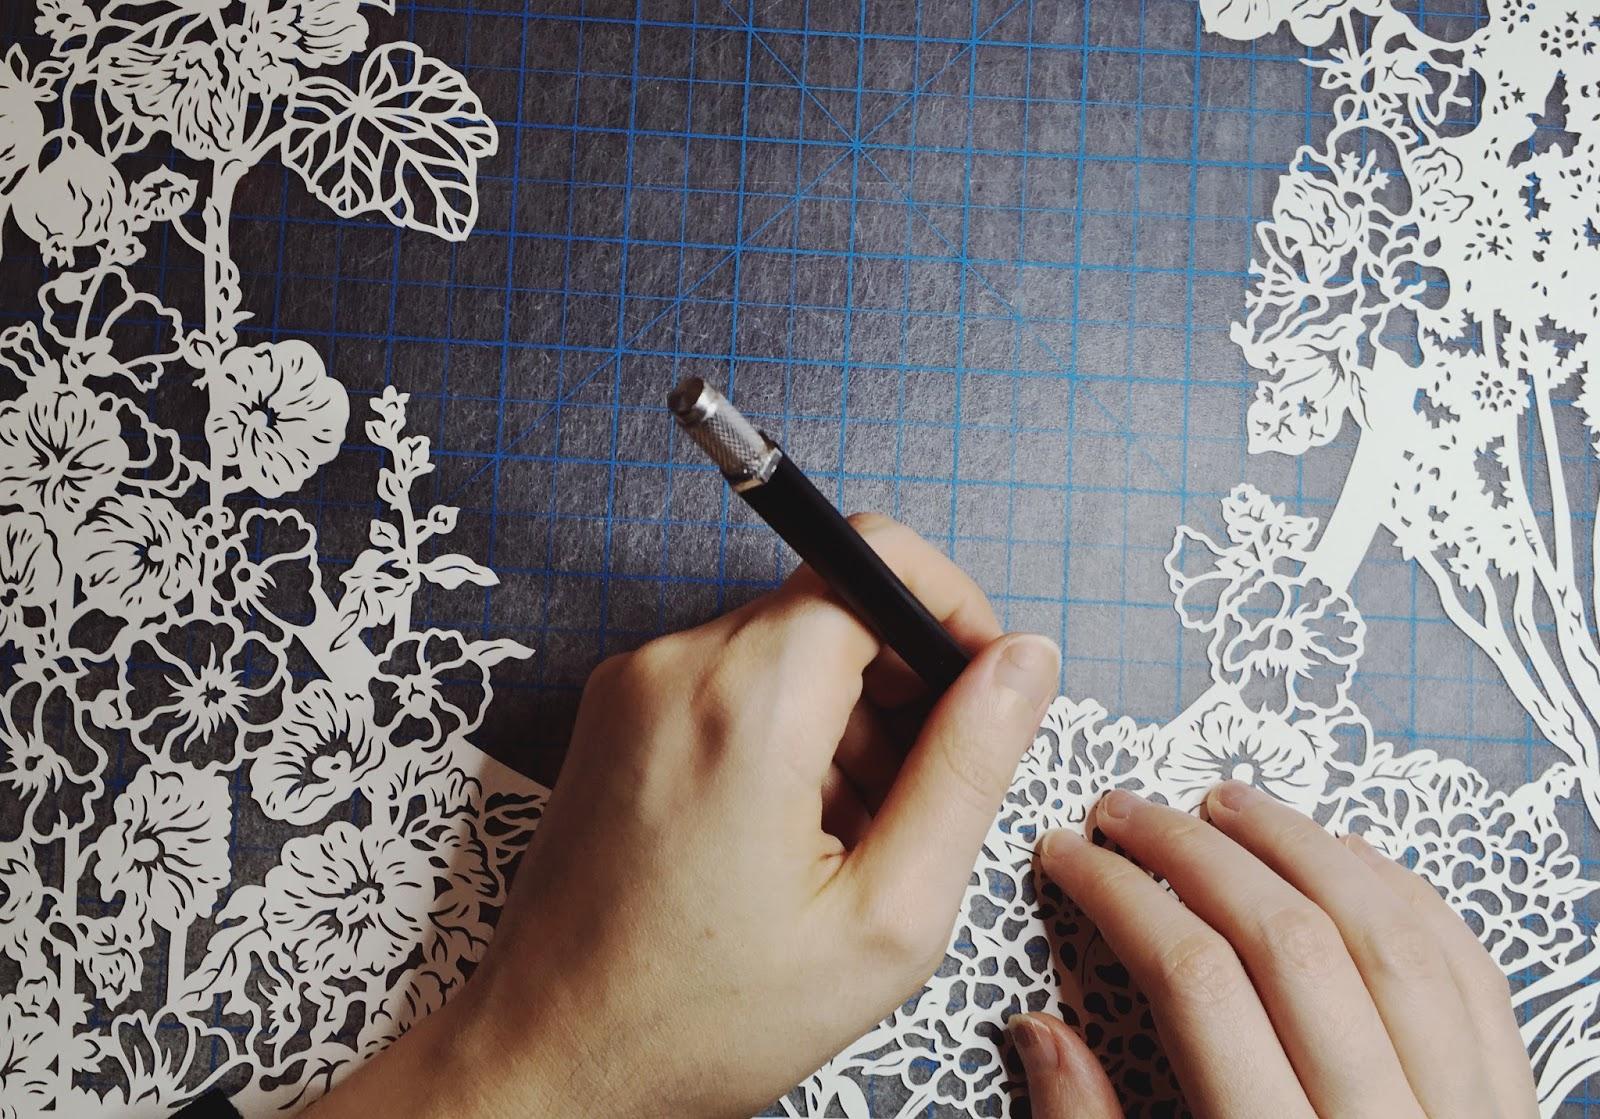 papercut artist Naomi Shiek papercutting a custom design quaker ketubah in her studio